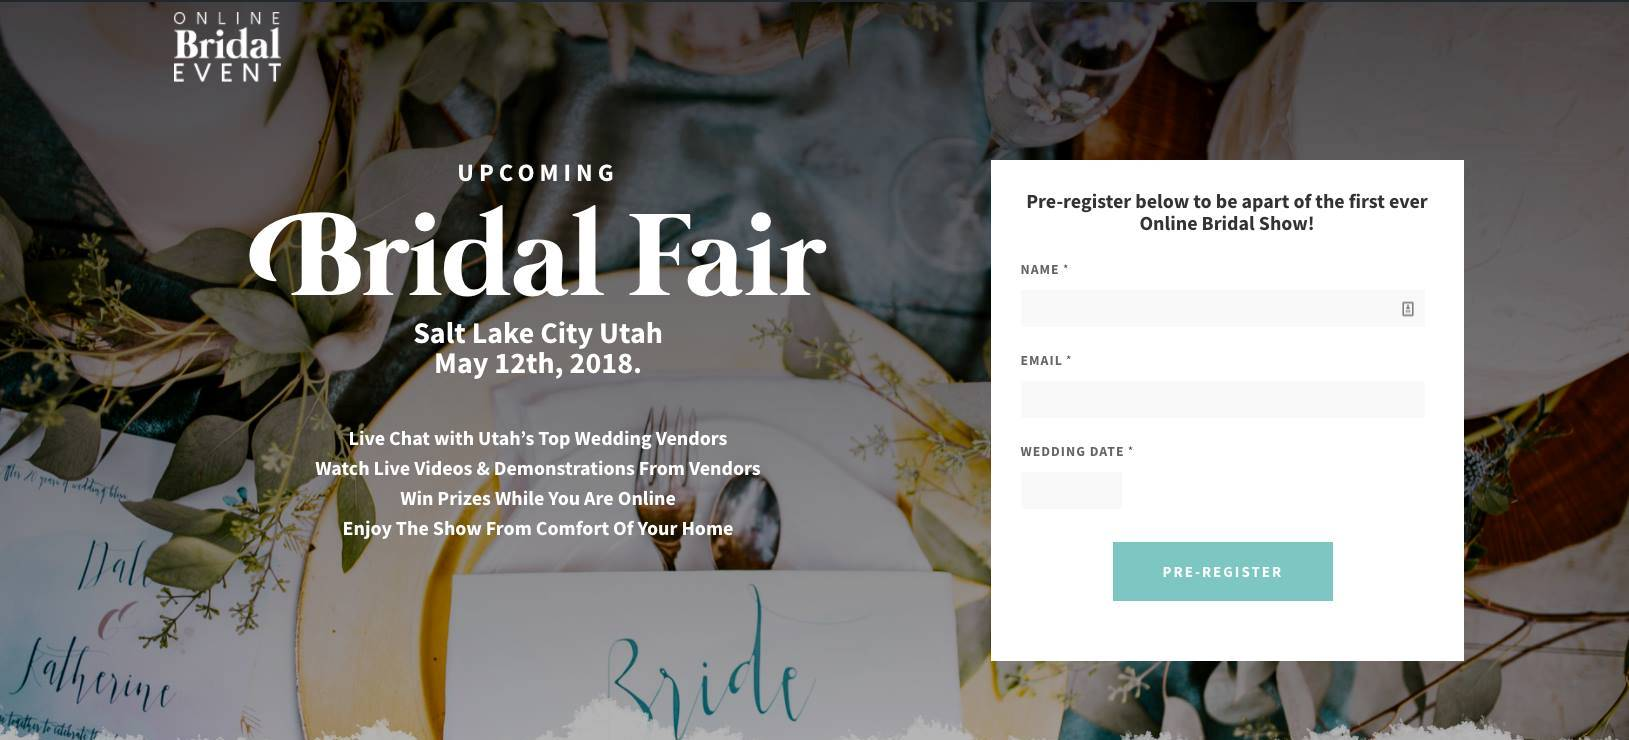 Utah-Online-Bridal-Event